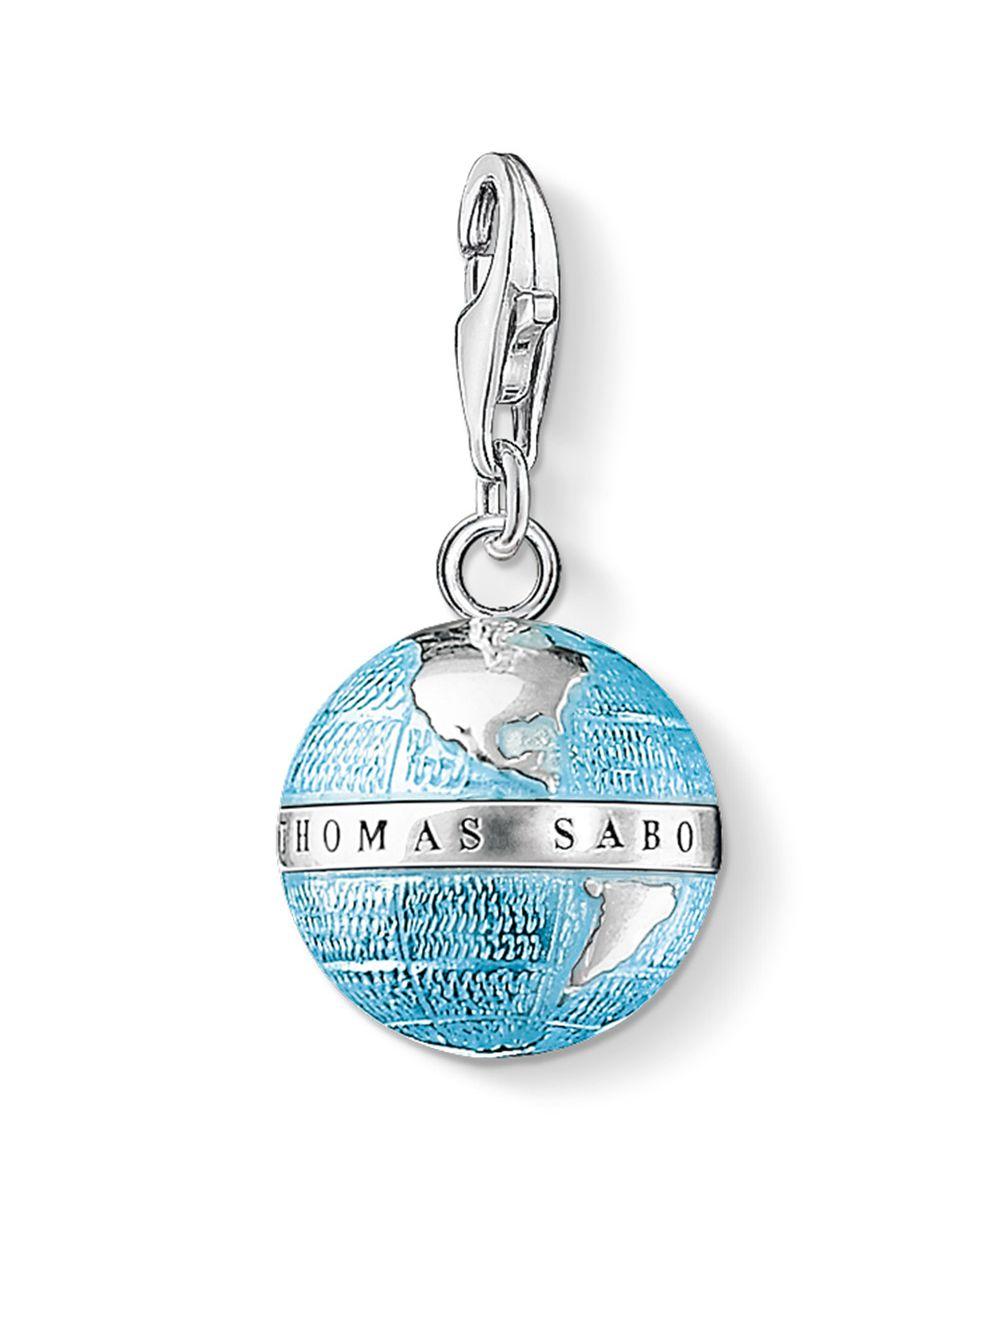 Thomas Sabo Charm pendant globe blue 0754-007-1 Thomas Sabo MTU7kYWEH7